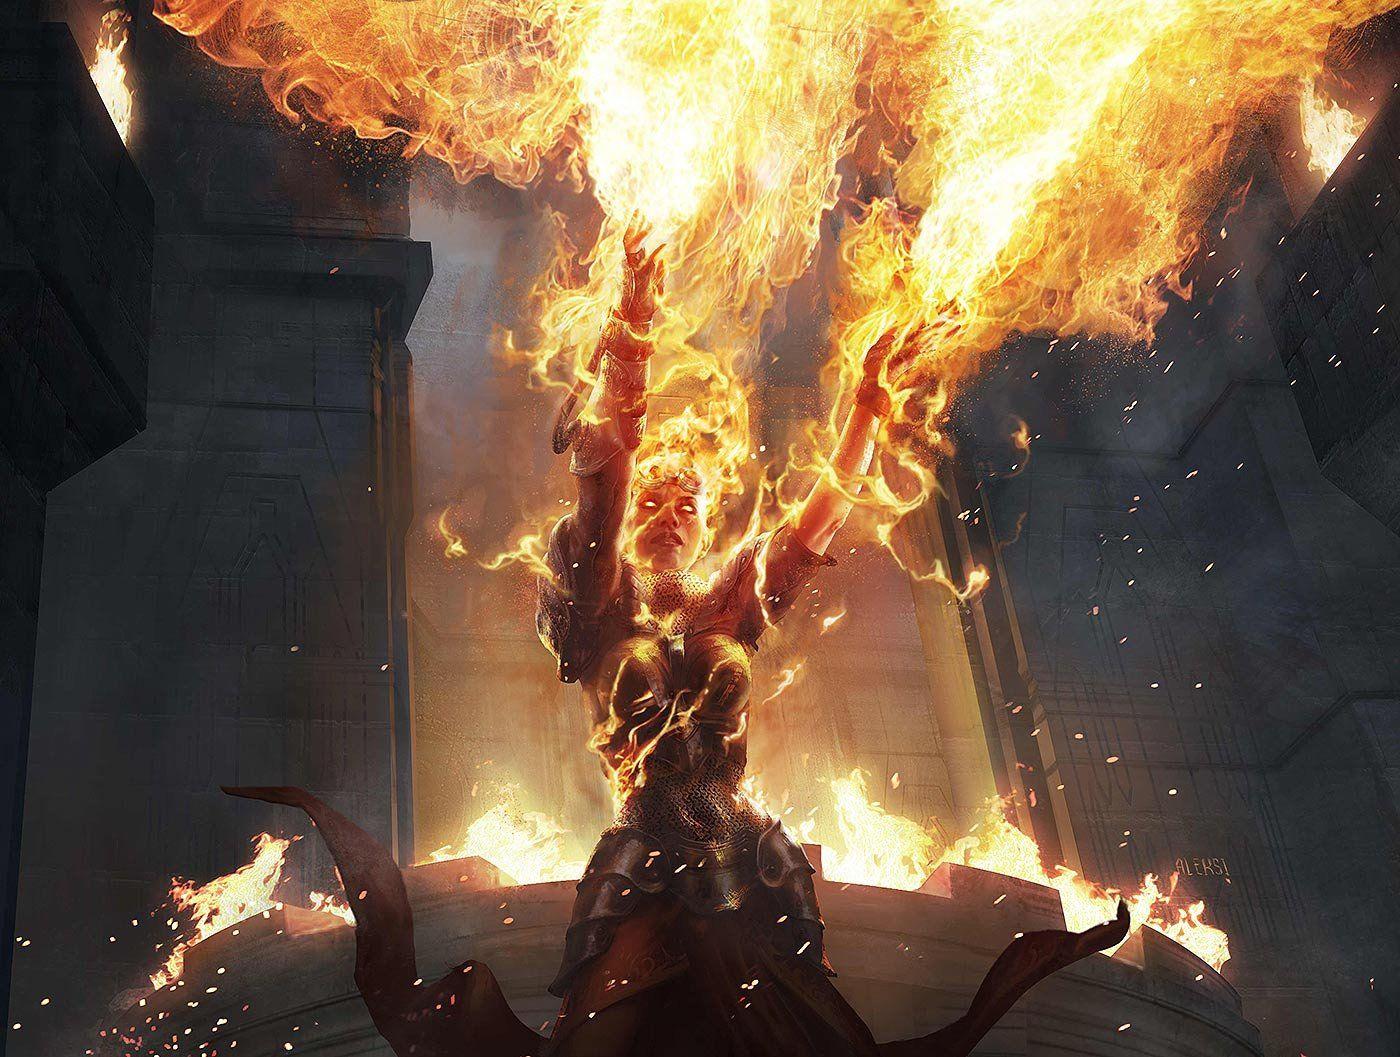 Chandra / Ravaging Blaze, Aleksi Briclot on ArtStation at https://www.artstation.com/artwork/chandra-ravaging-blaze